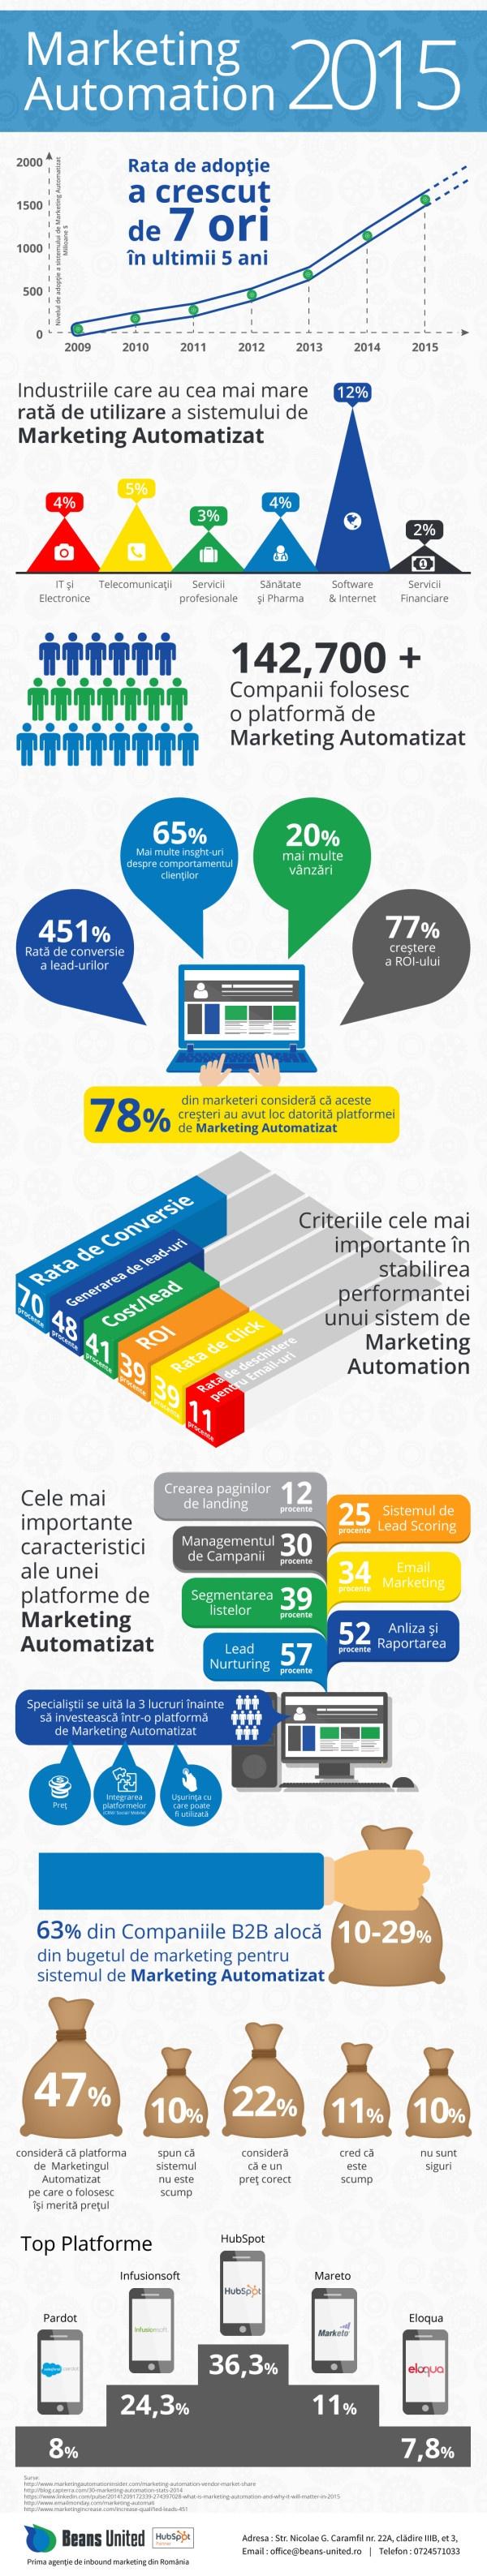 Infografic Marketing Automation 2015